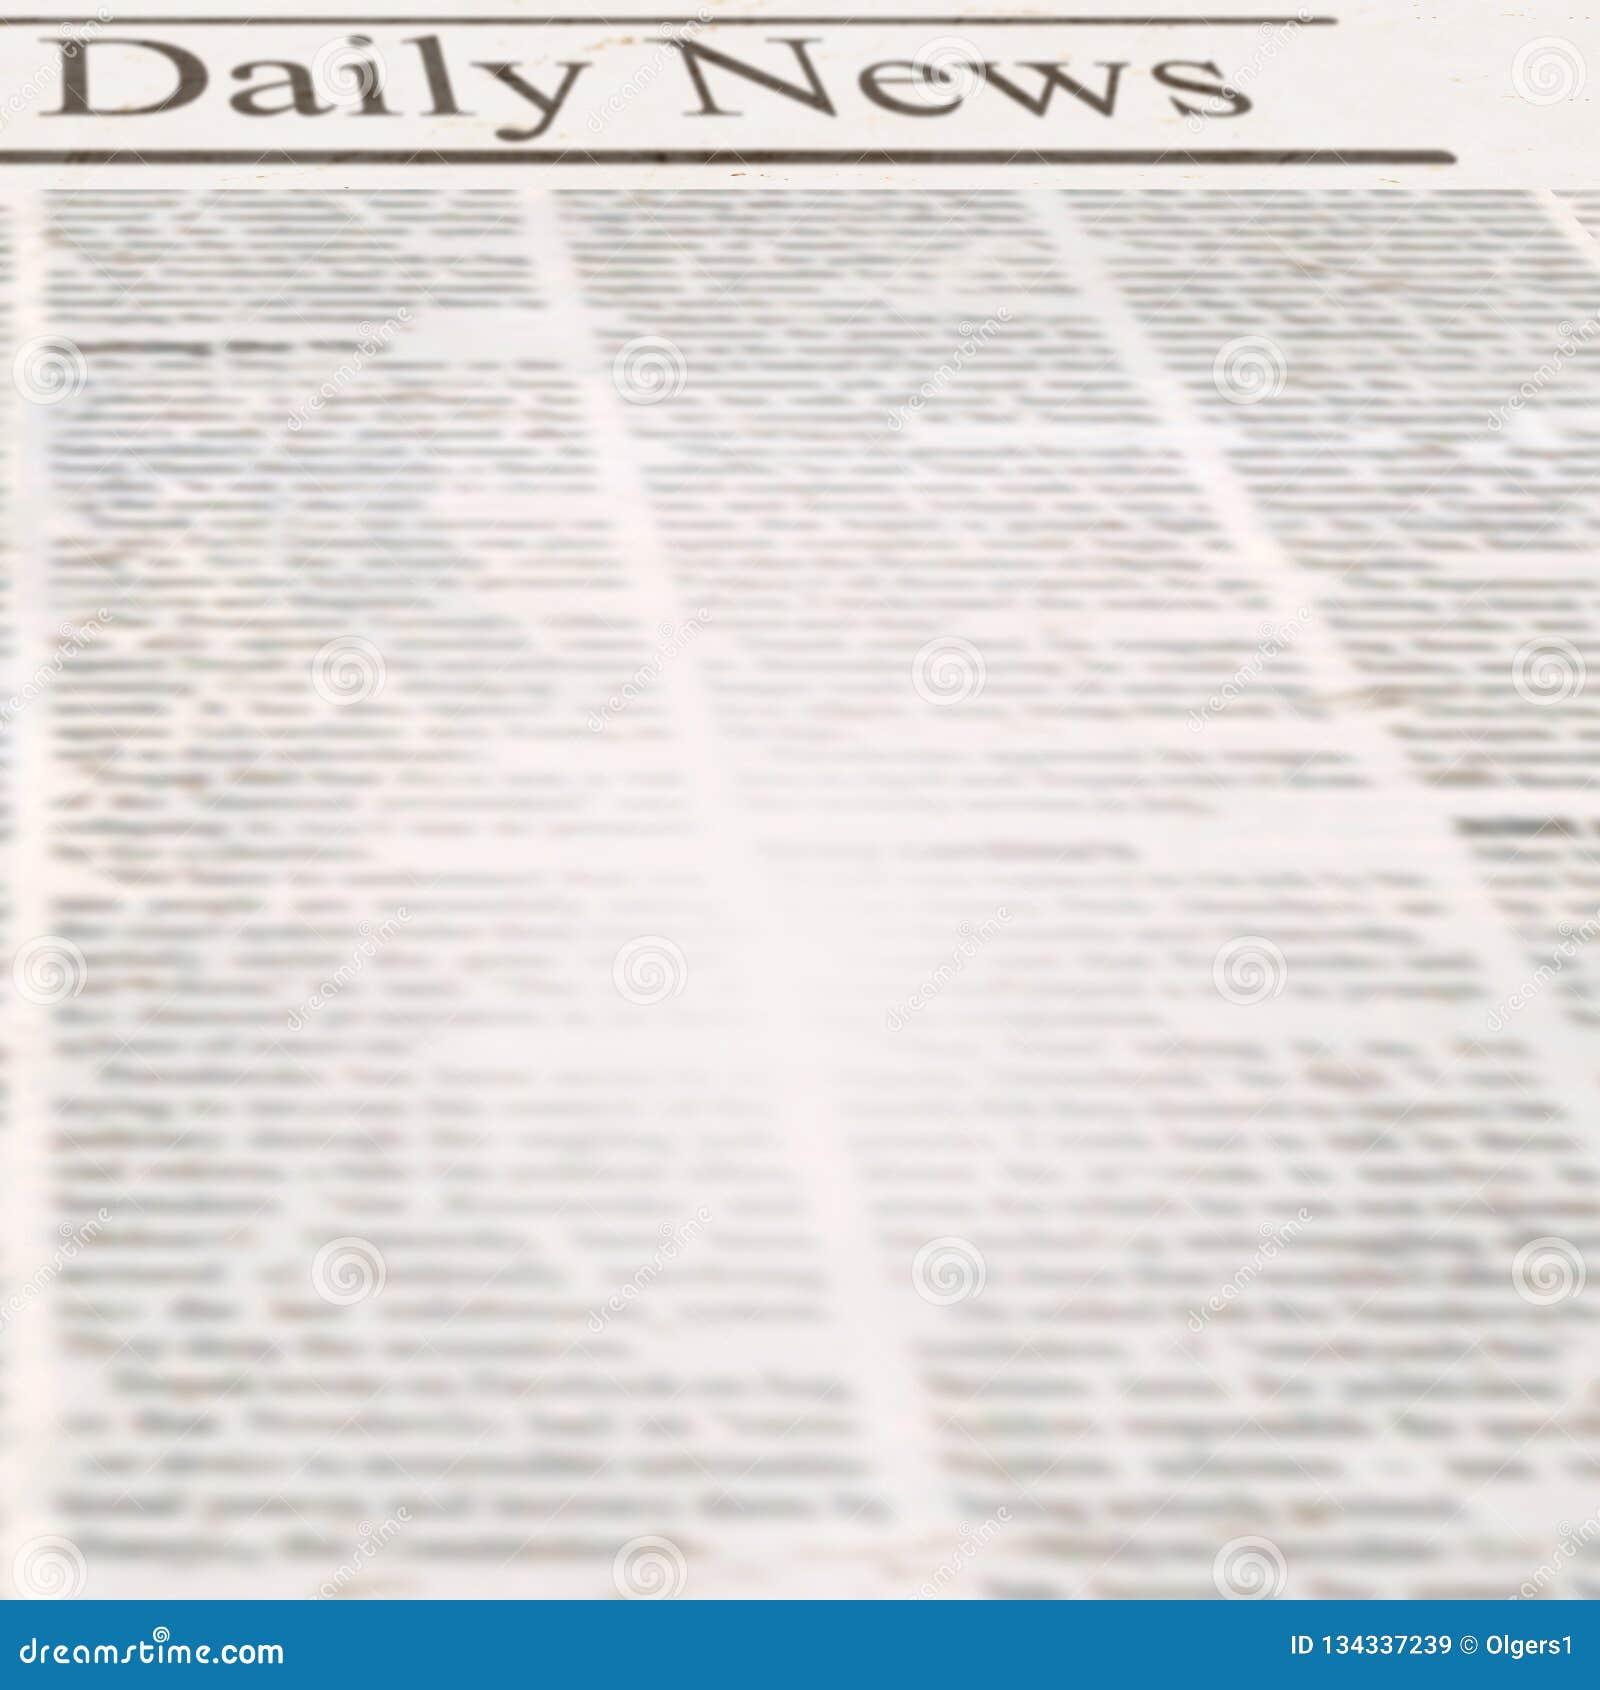 Newspaper Headline Template from thumbs.dreamstime.com